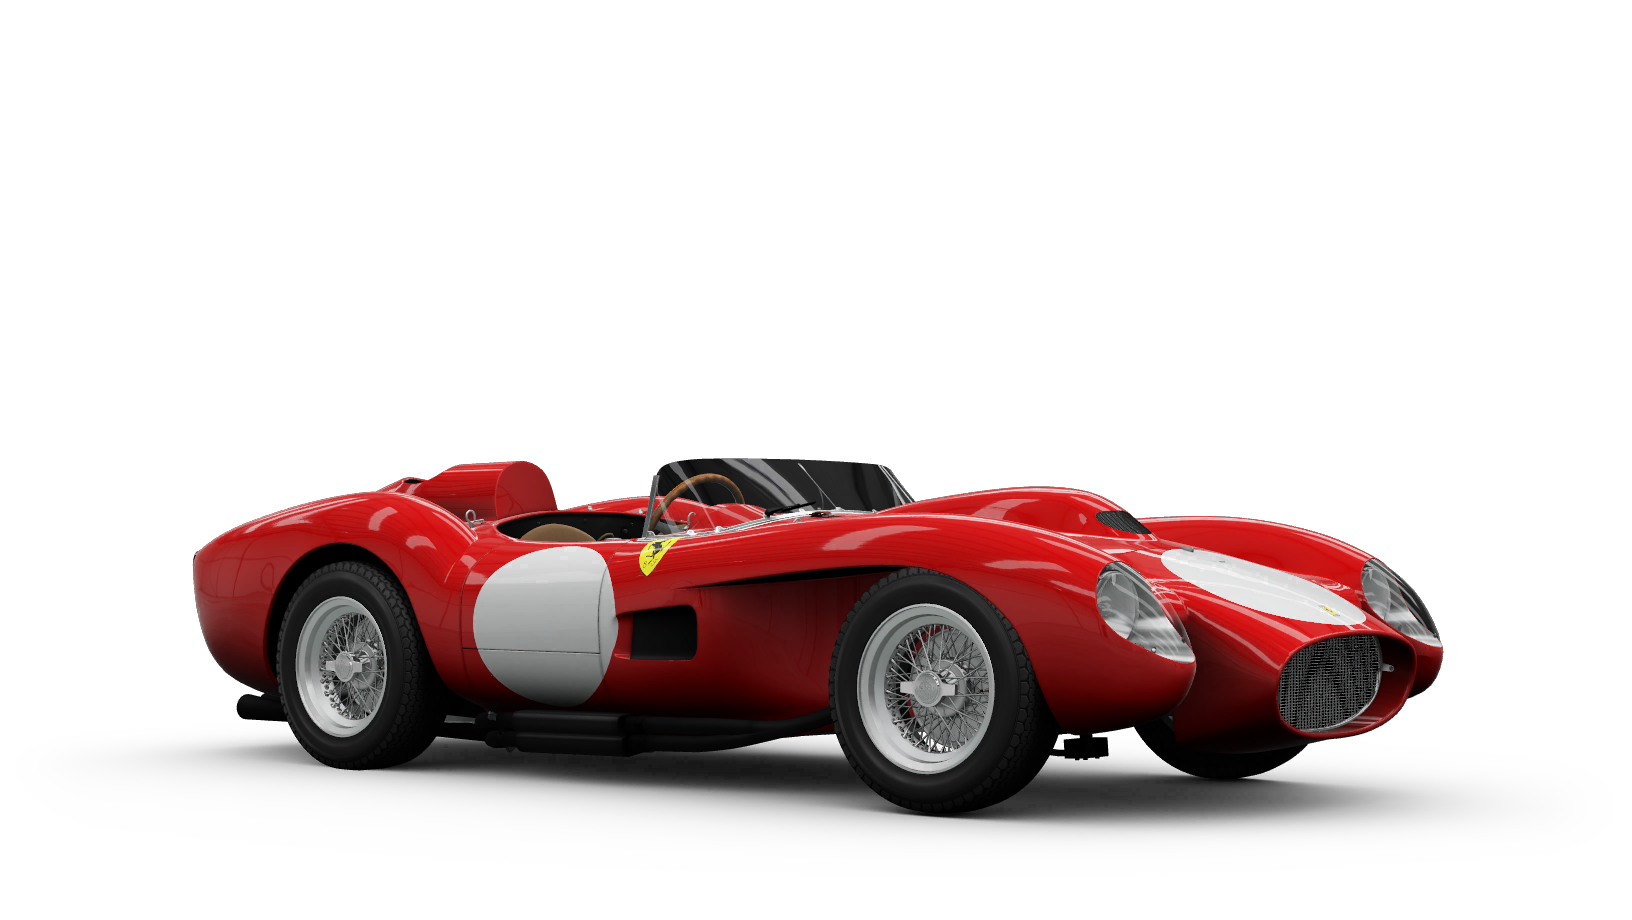 Ferrari 250 Testa Rossa Forza Motorsport Wiki Fandom